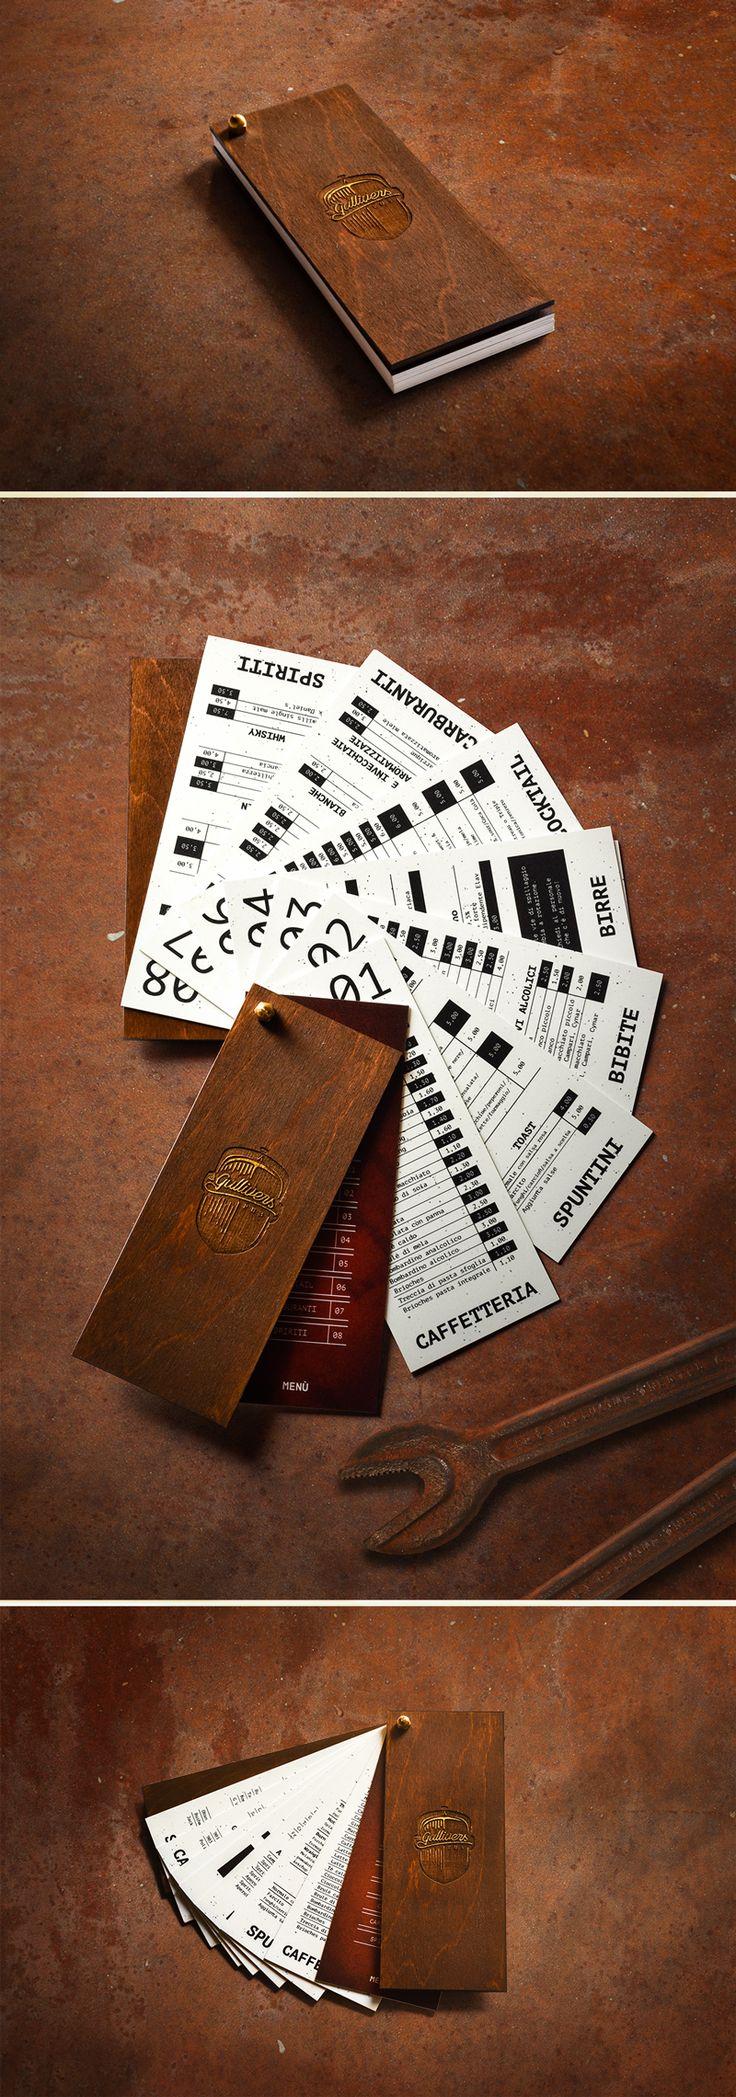 The Gullivers Pub menu | www.ofmagnet.com #graphic #design #menu #handmade #pub #rusty #wood #black #white #palette #industrial #garage #food #café